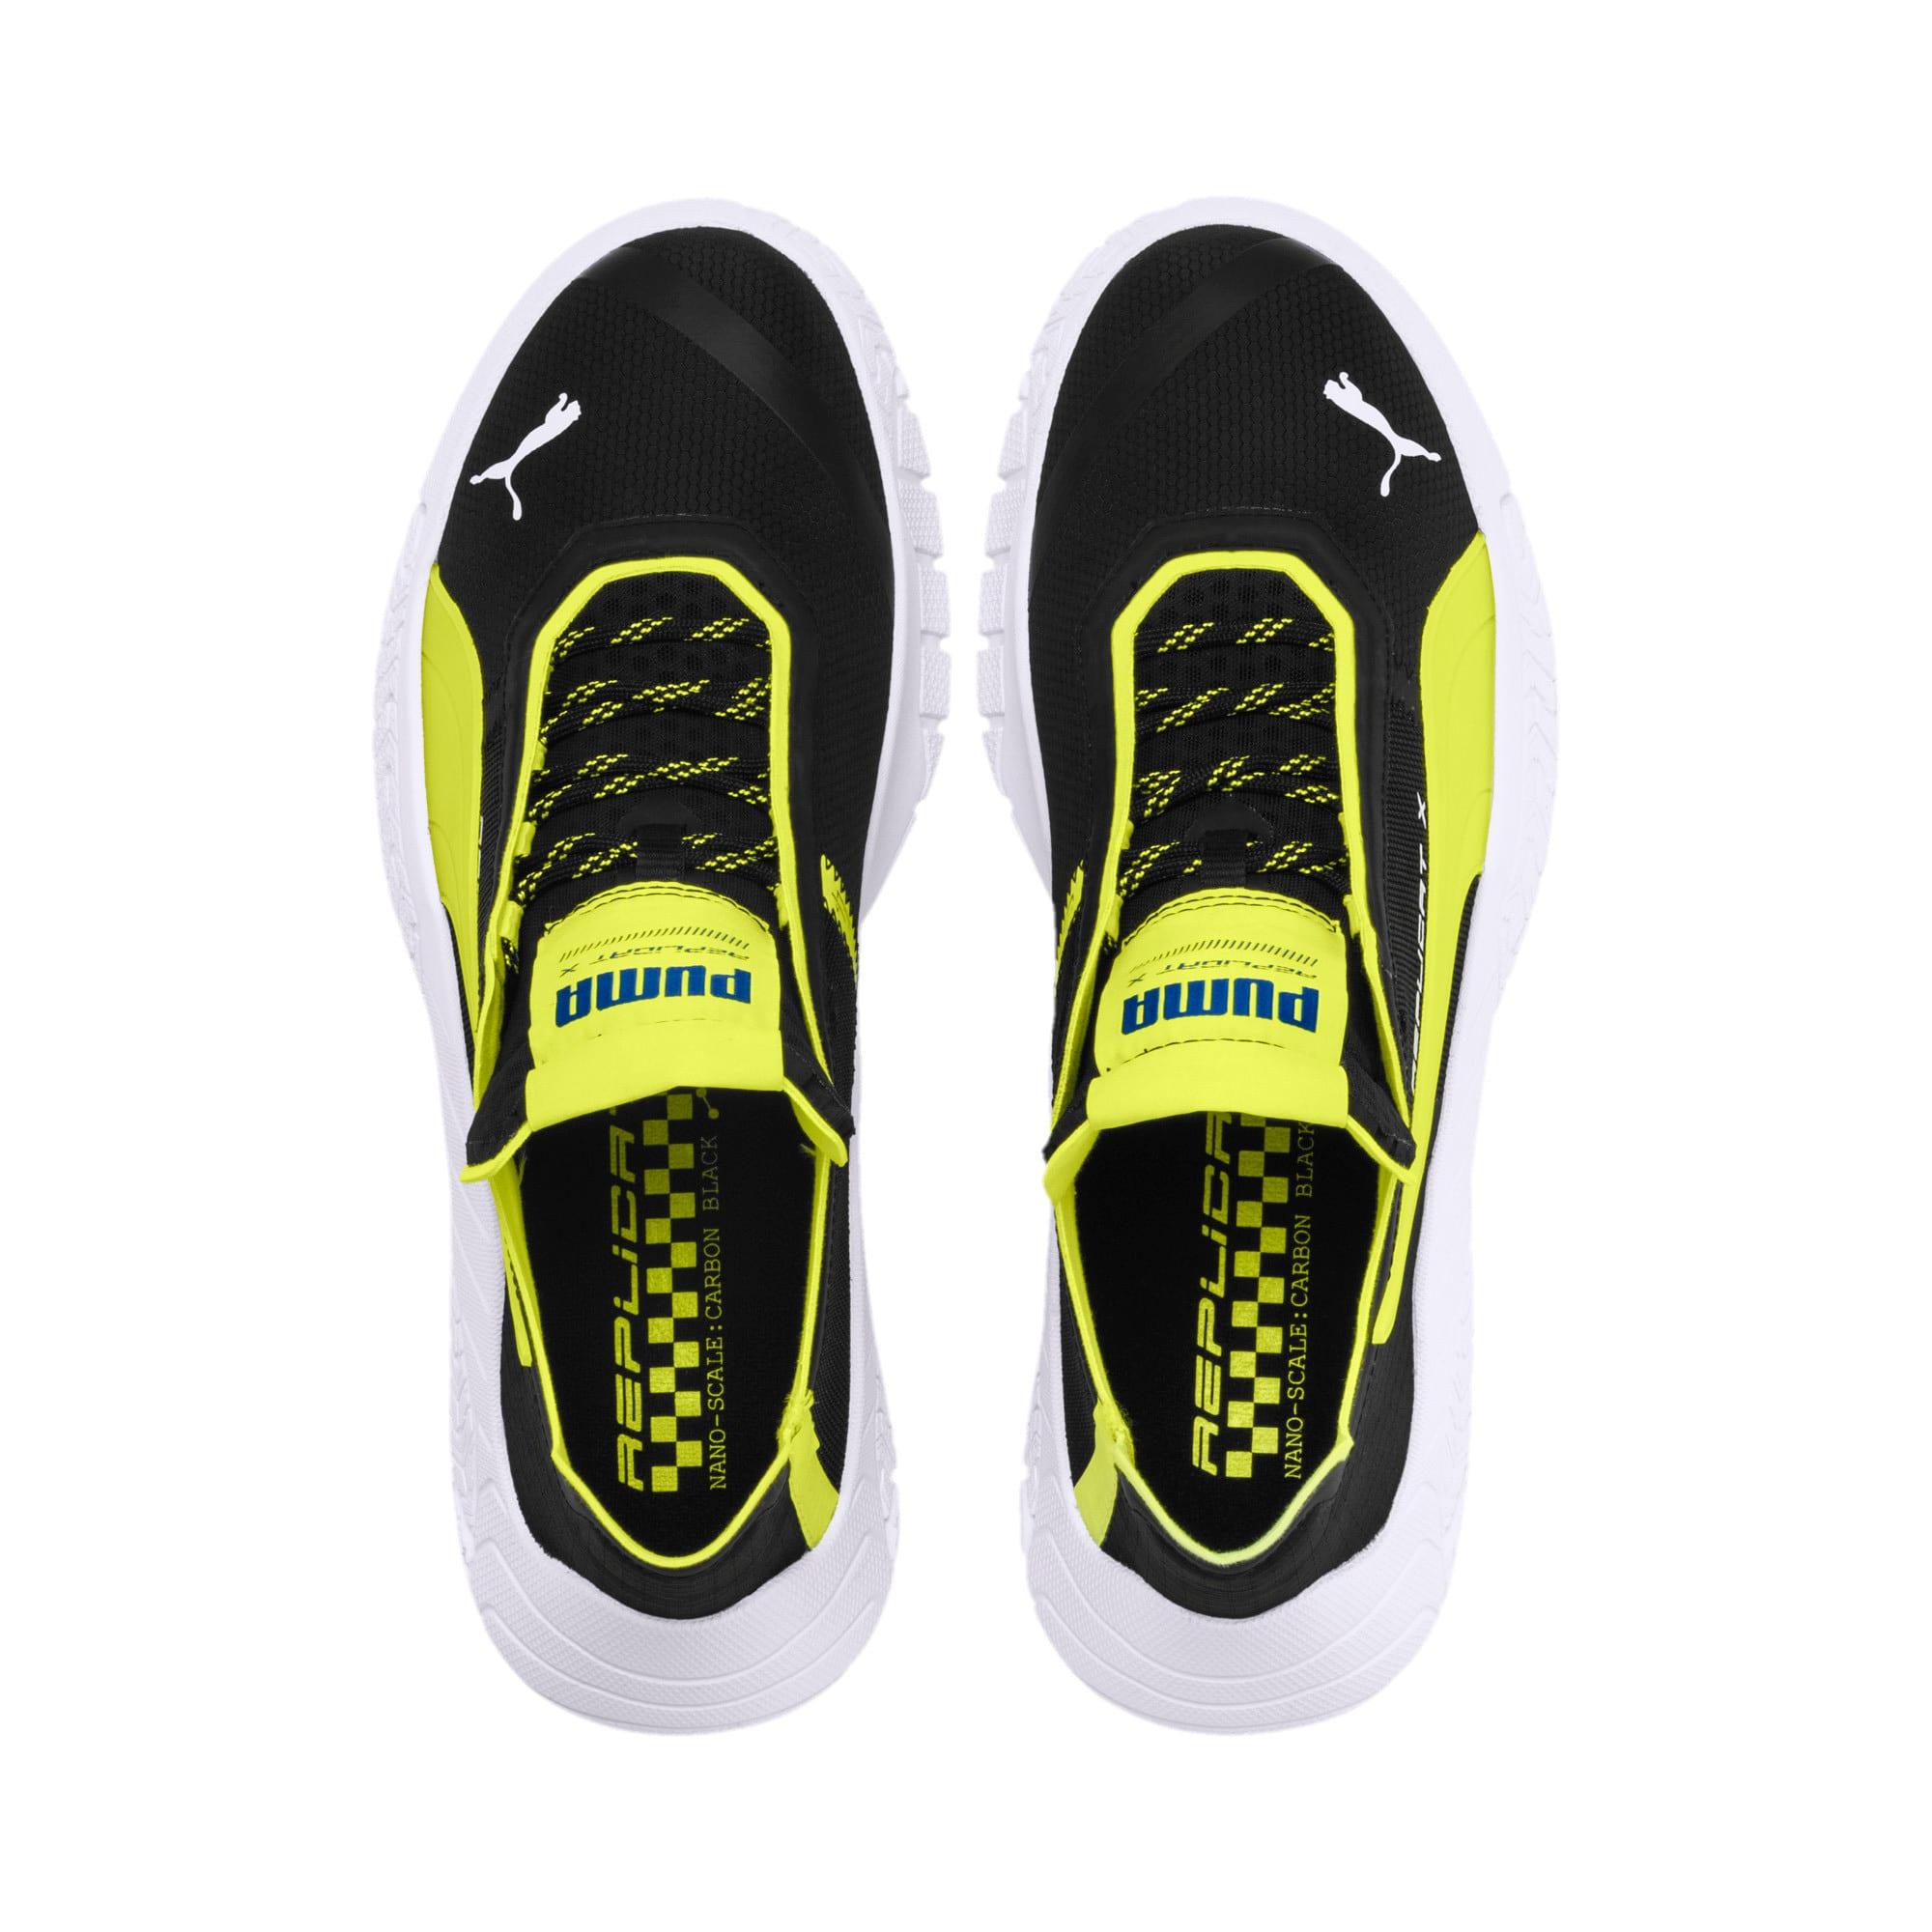 Thumbnail 6 of Replicat-X Circuit Motorsport Shoes, Black-Fizzy Yellow-White, medium